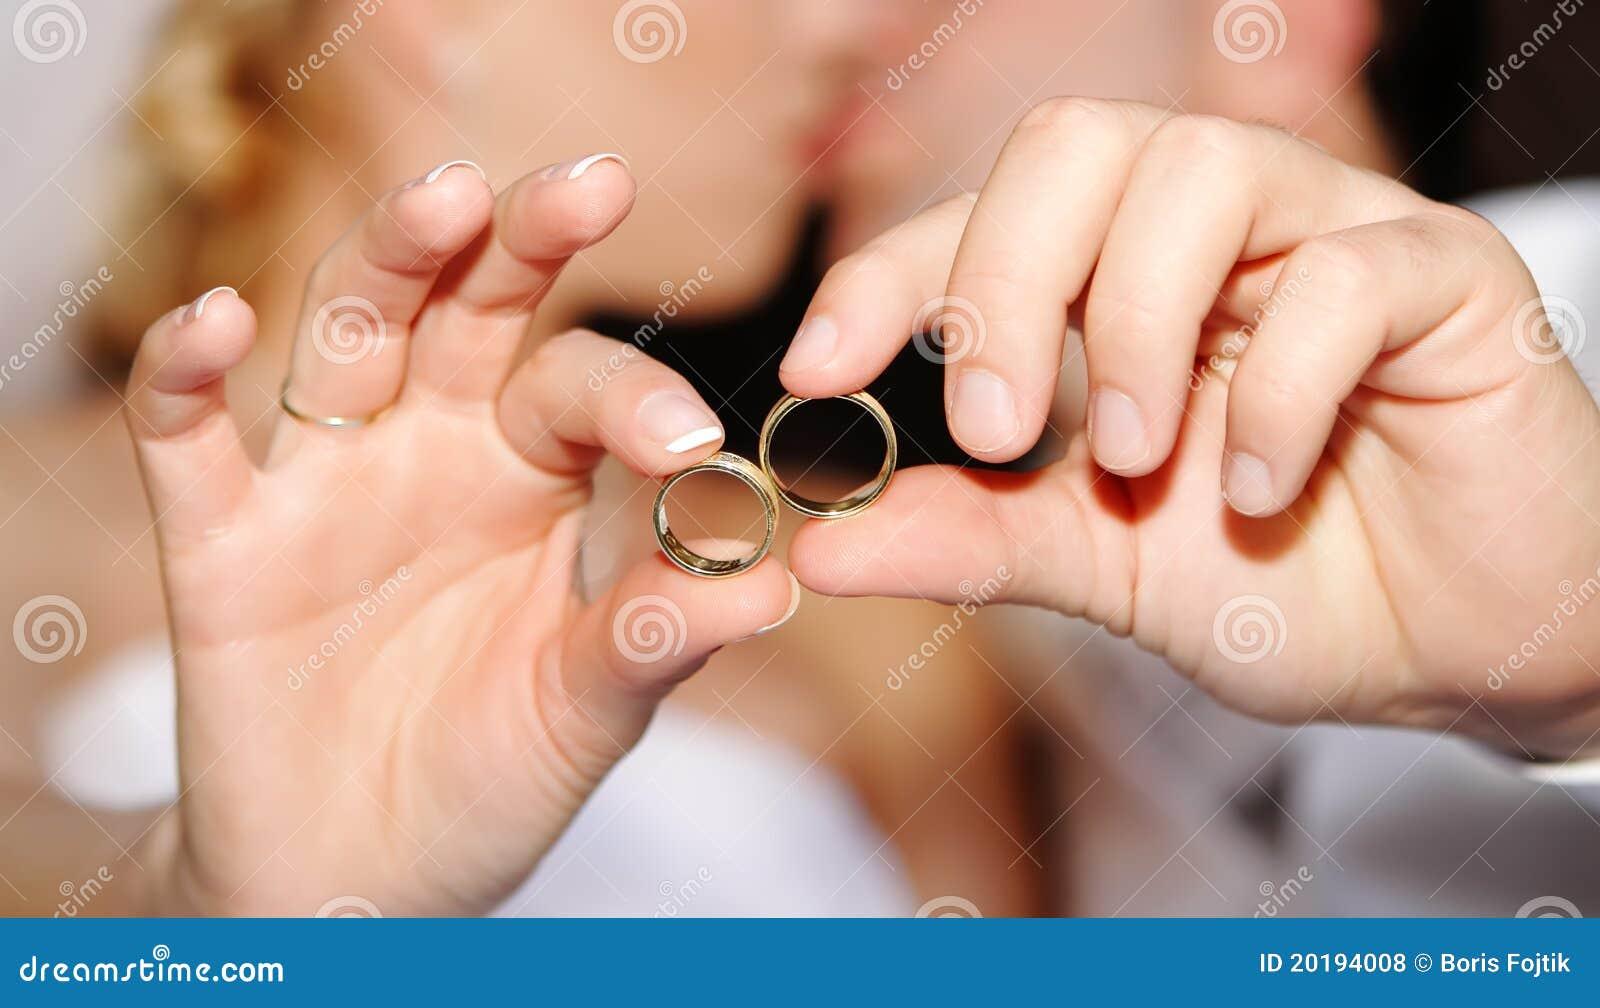 hands wedding rings